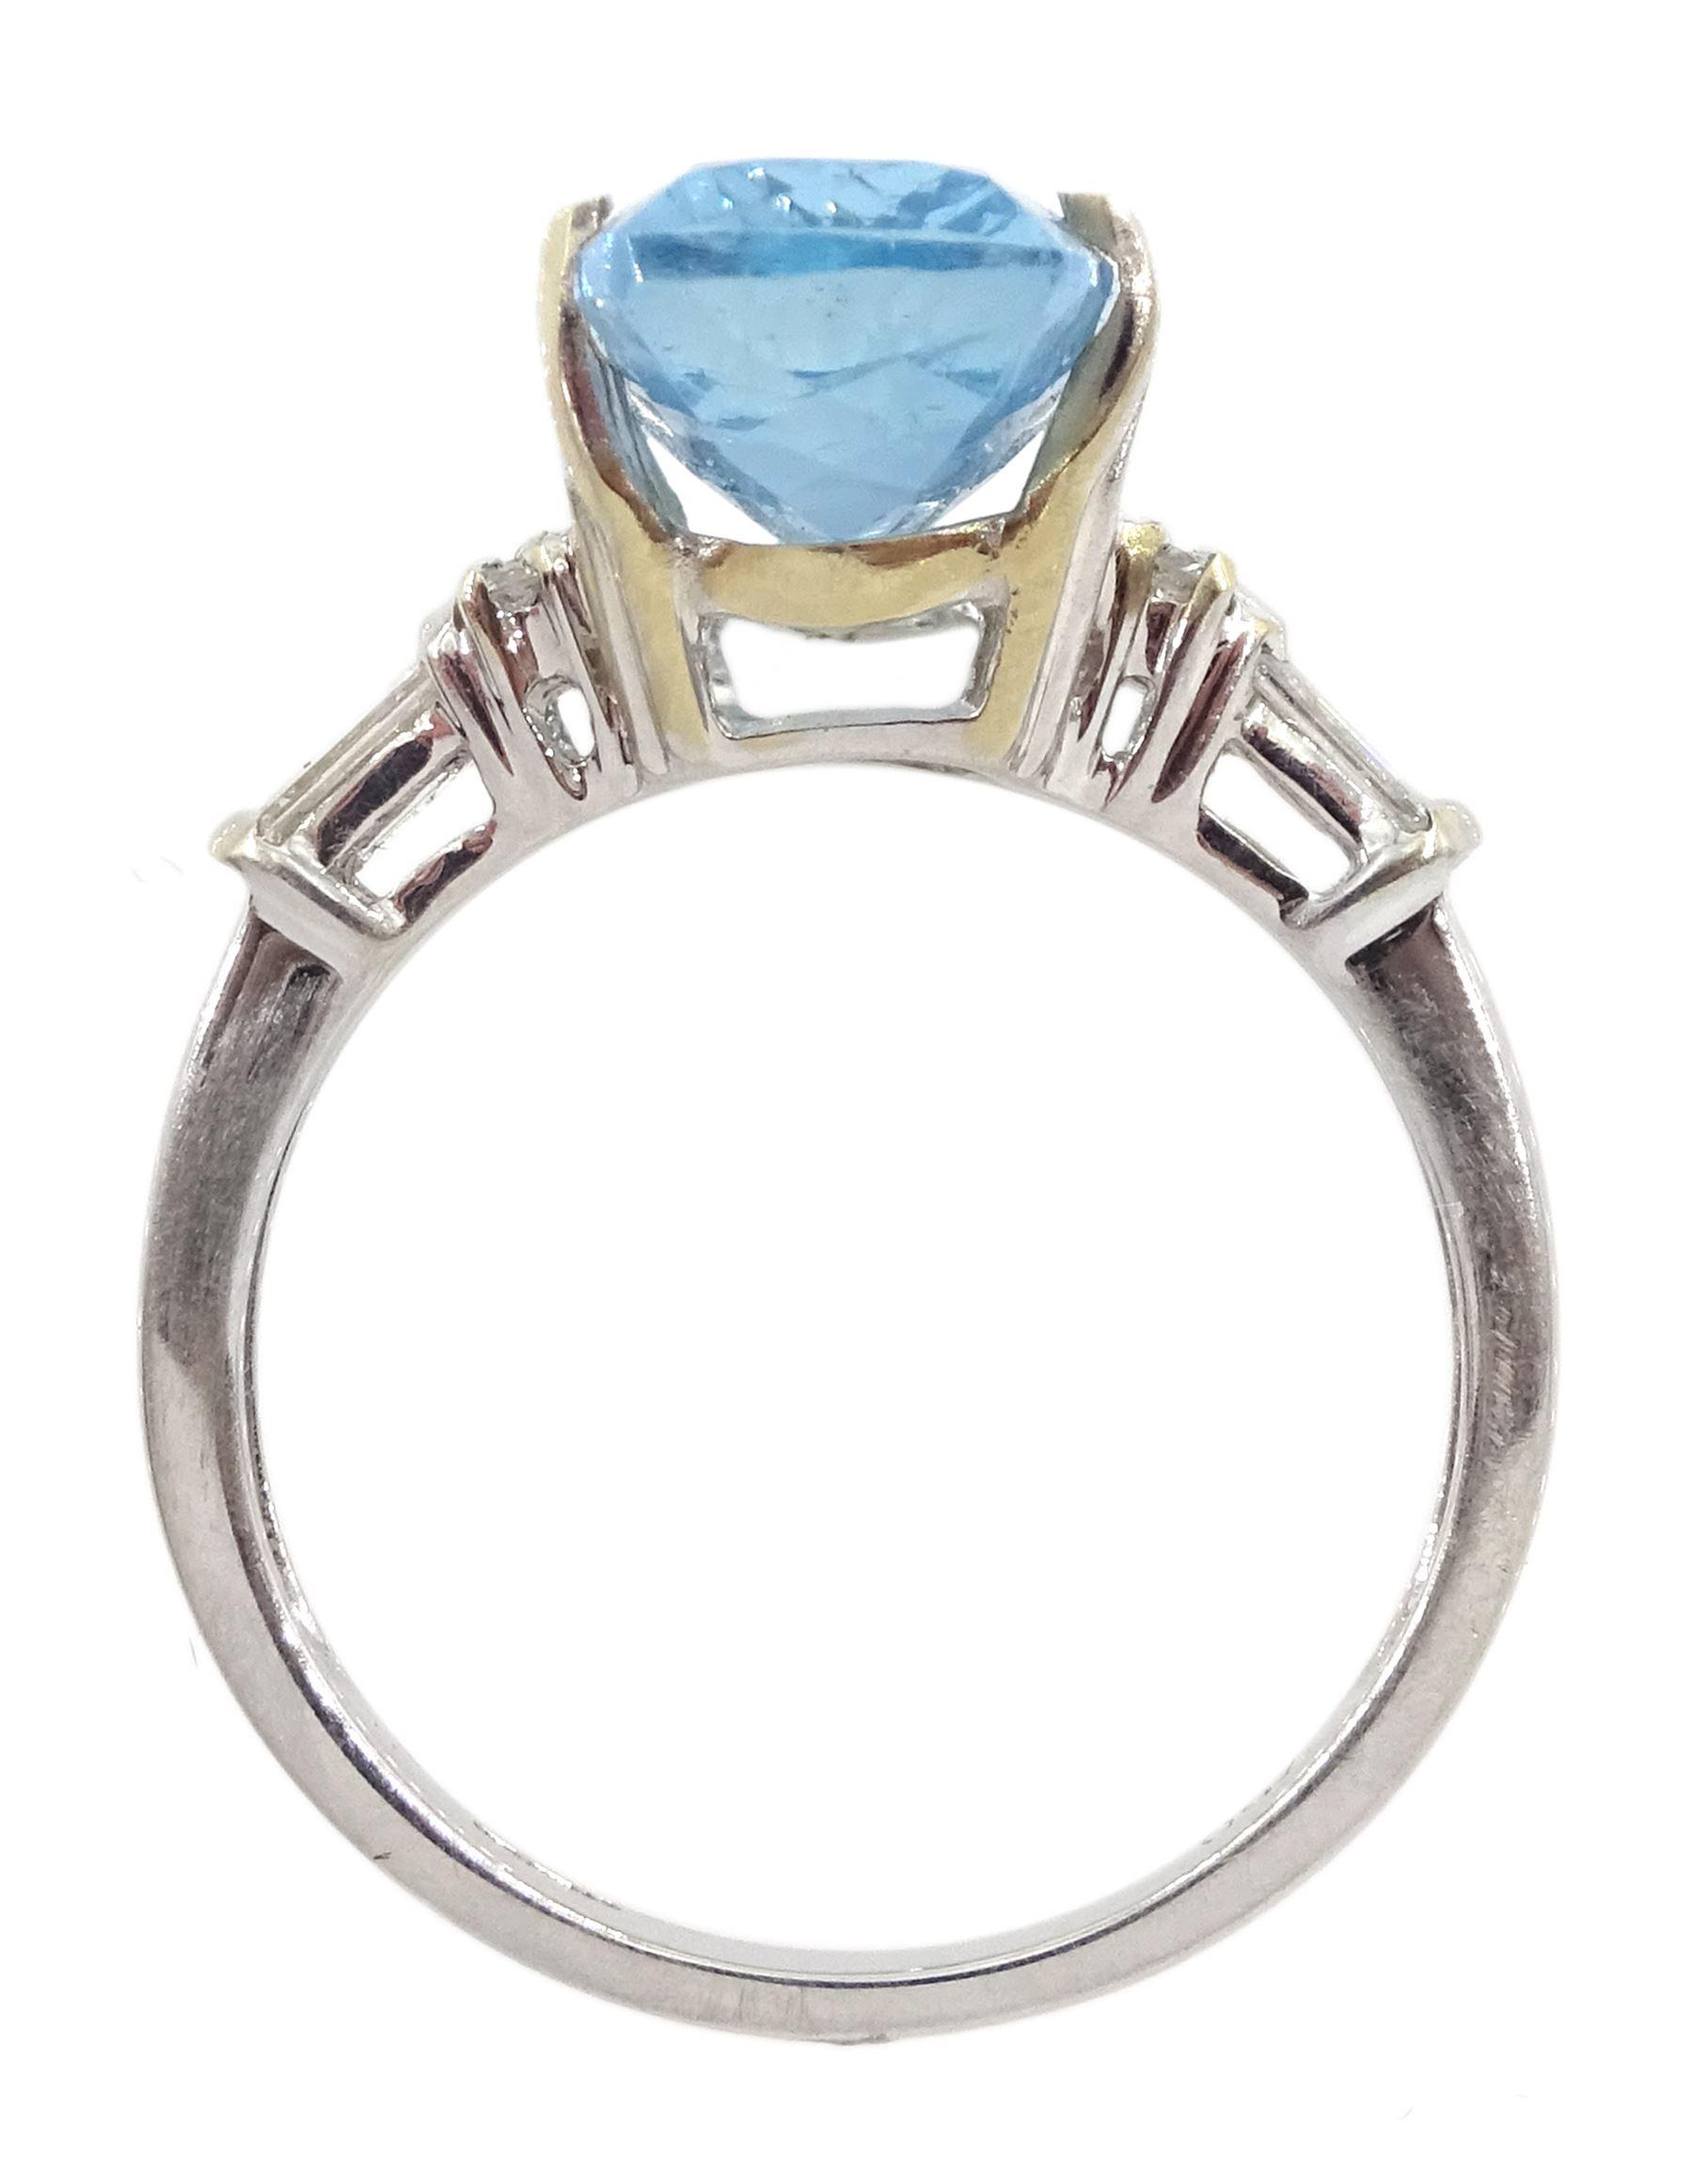 18ct white gold aquamarine ring - Image 4 of 4